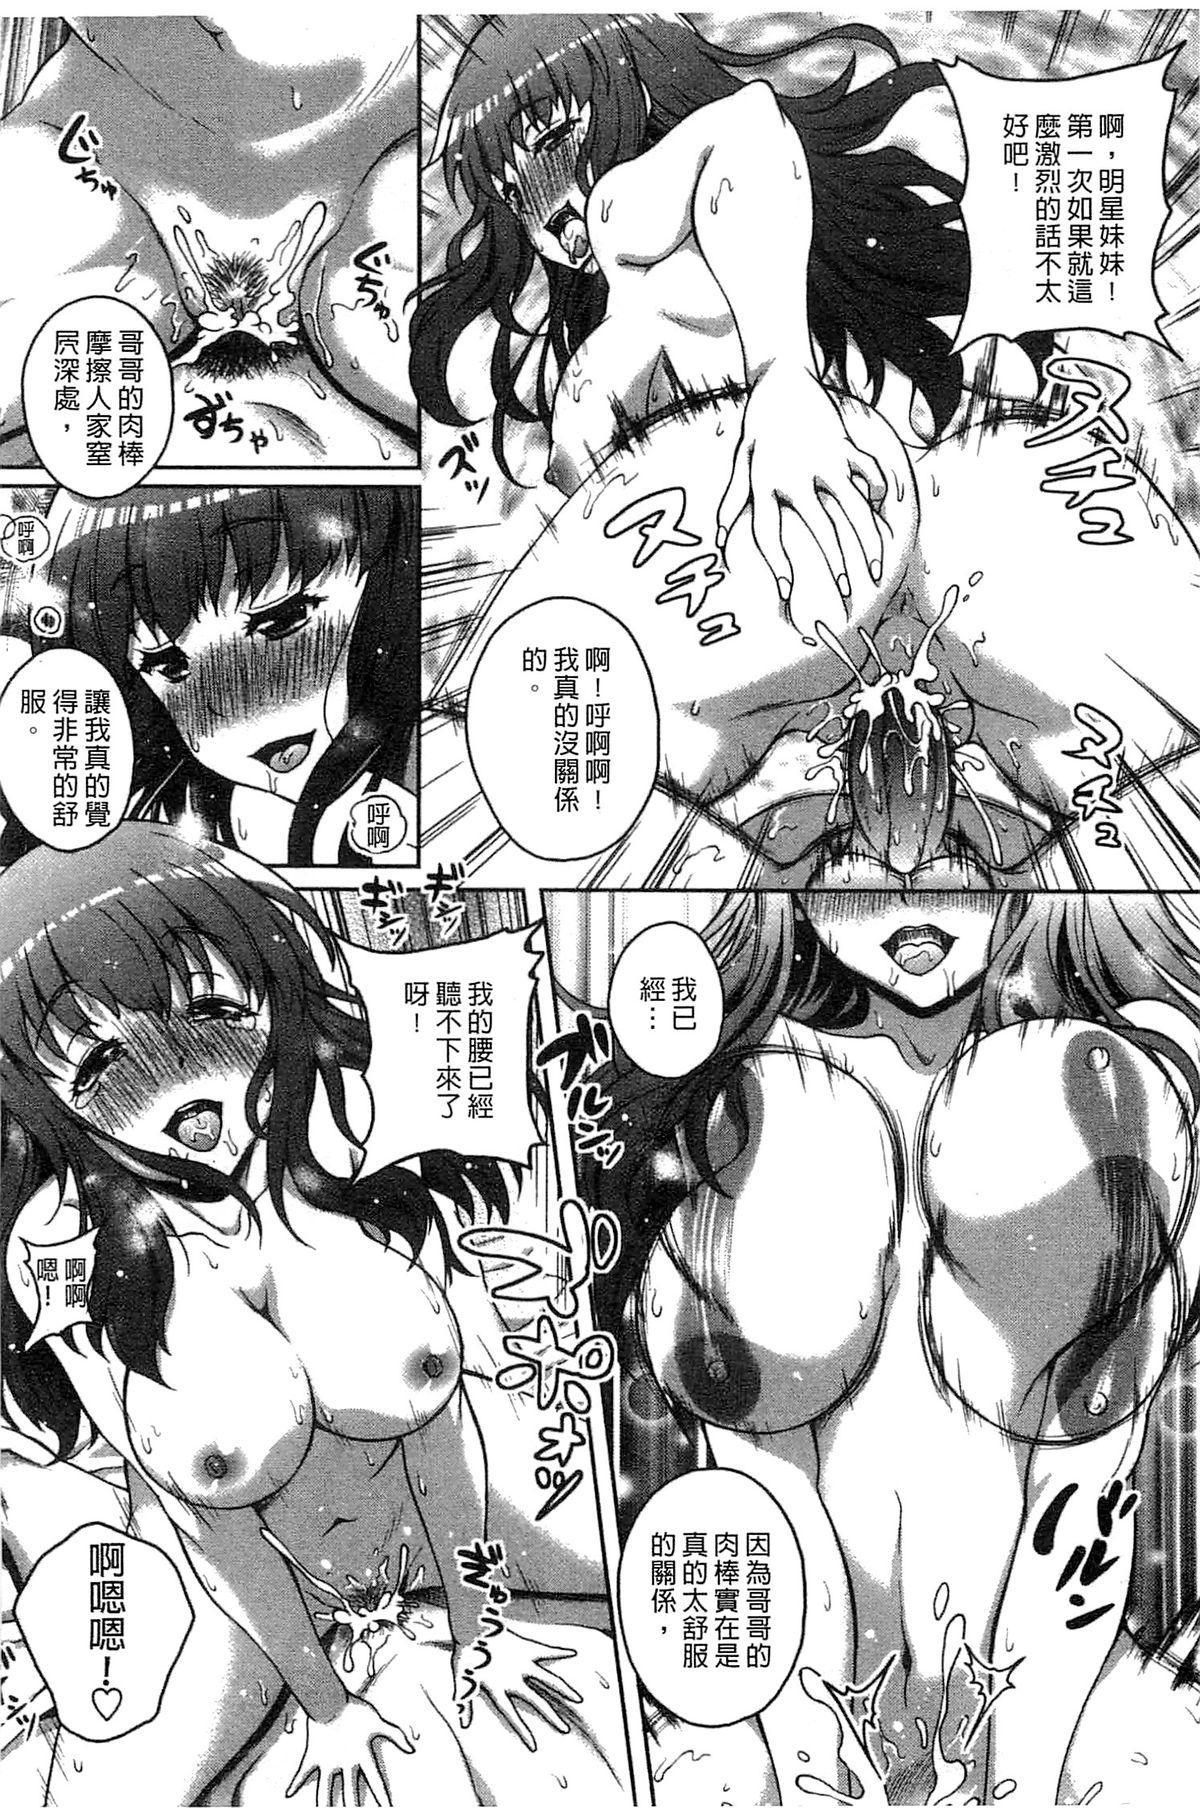 Hajimete nan dakara - First sexual experience 142